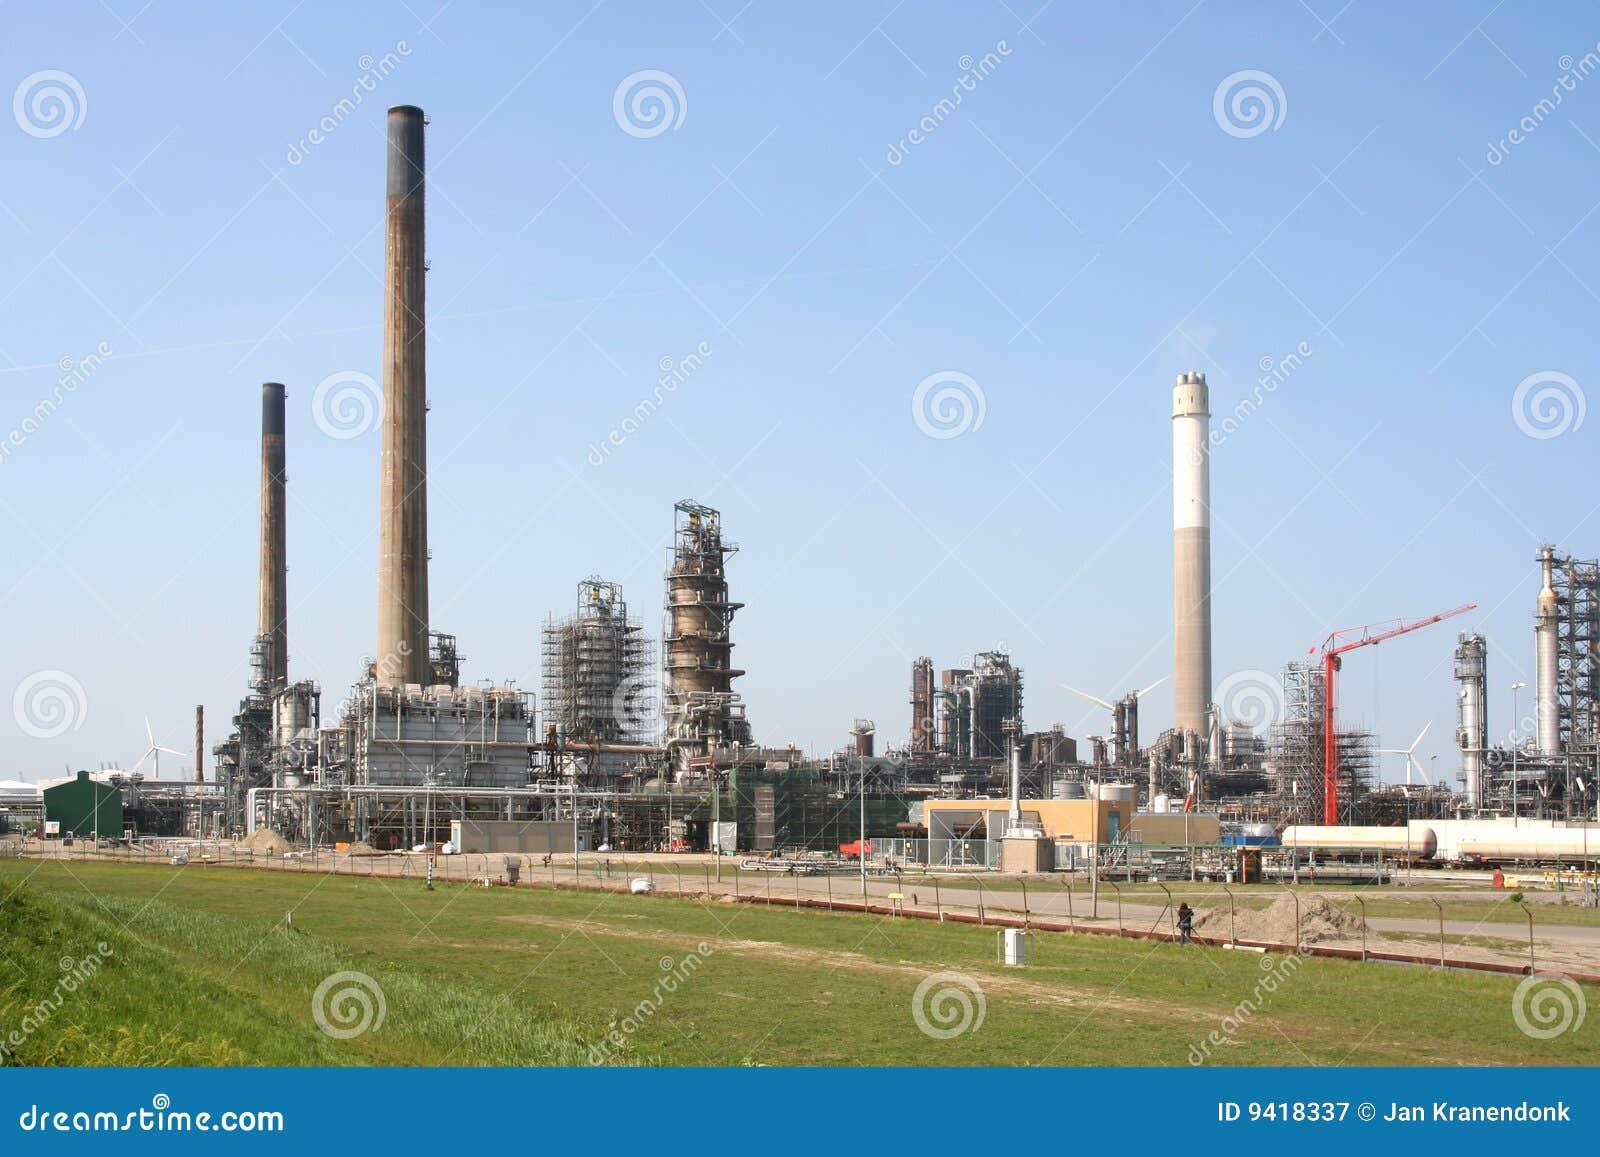 Berühmt Dampfkessel Prozess Bilder - Elektrische Schaltplan-Ideen ...